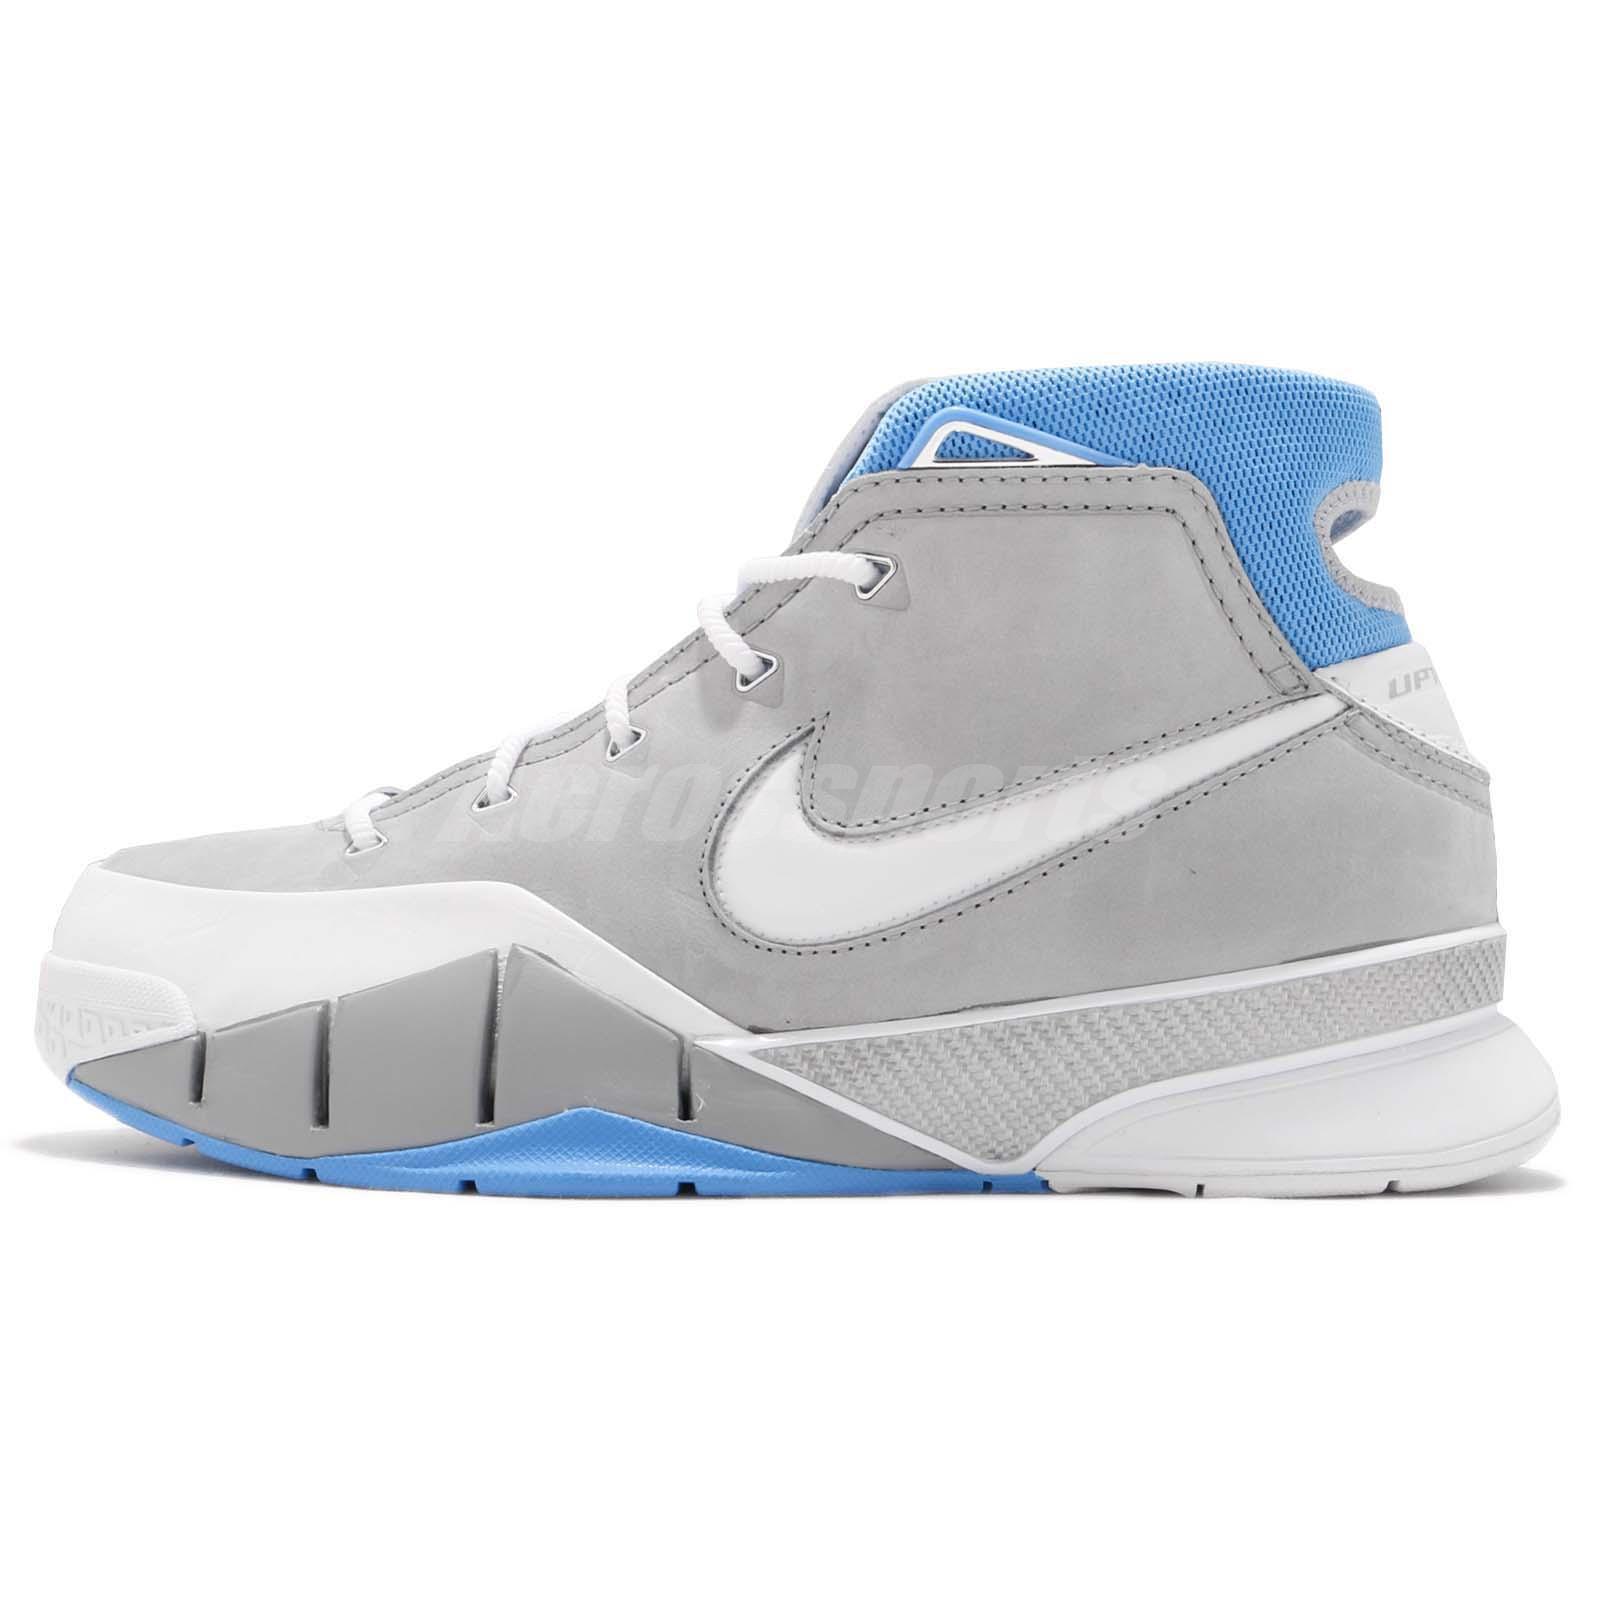 promo code efe13 68d63 Nike Kobe 1 Protro MPLS Bryant Mamba Grey Blue Men Basketball Shoes  AQ2728-001